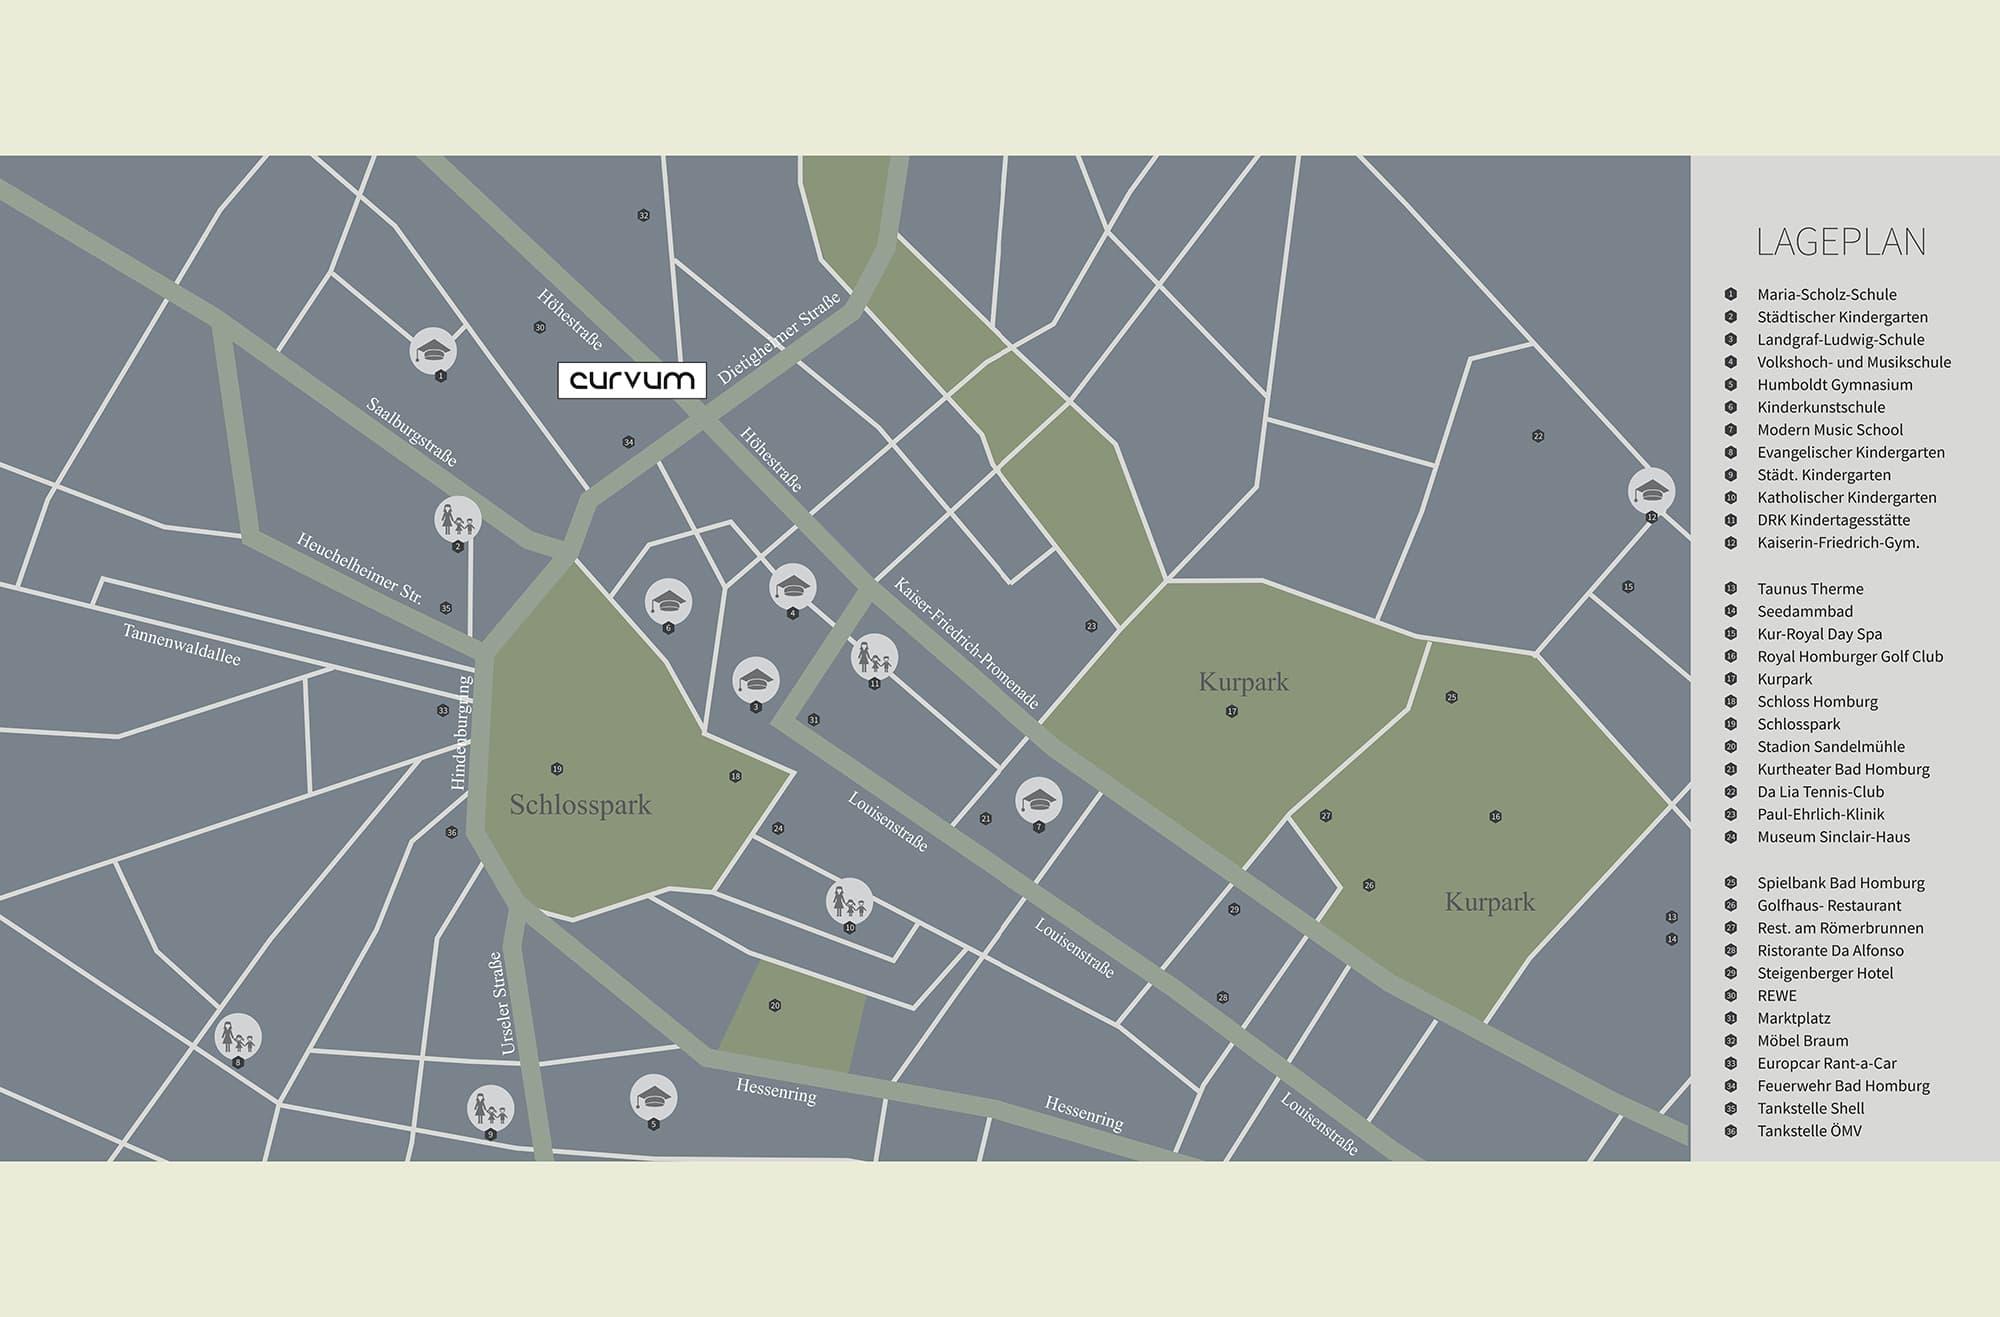 mapa2-manja